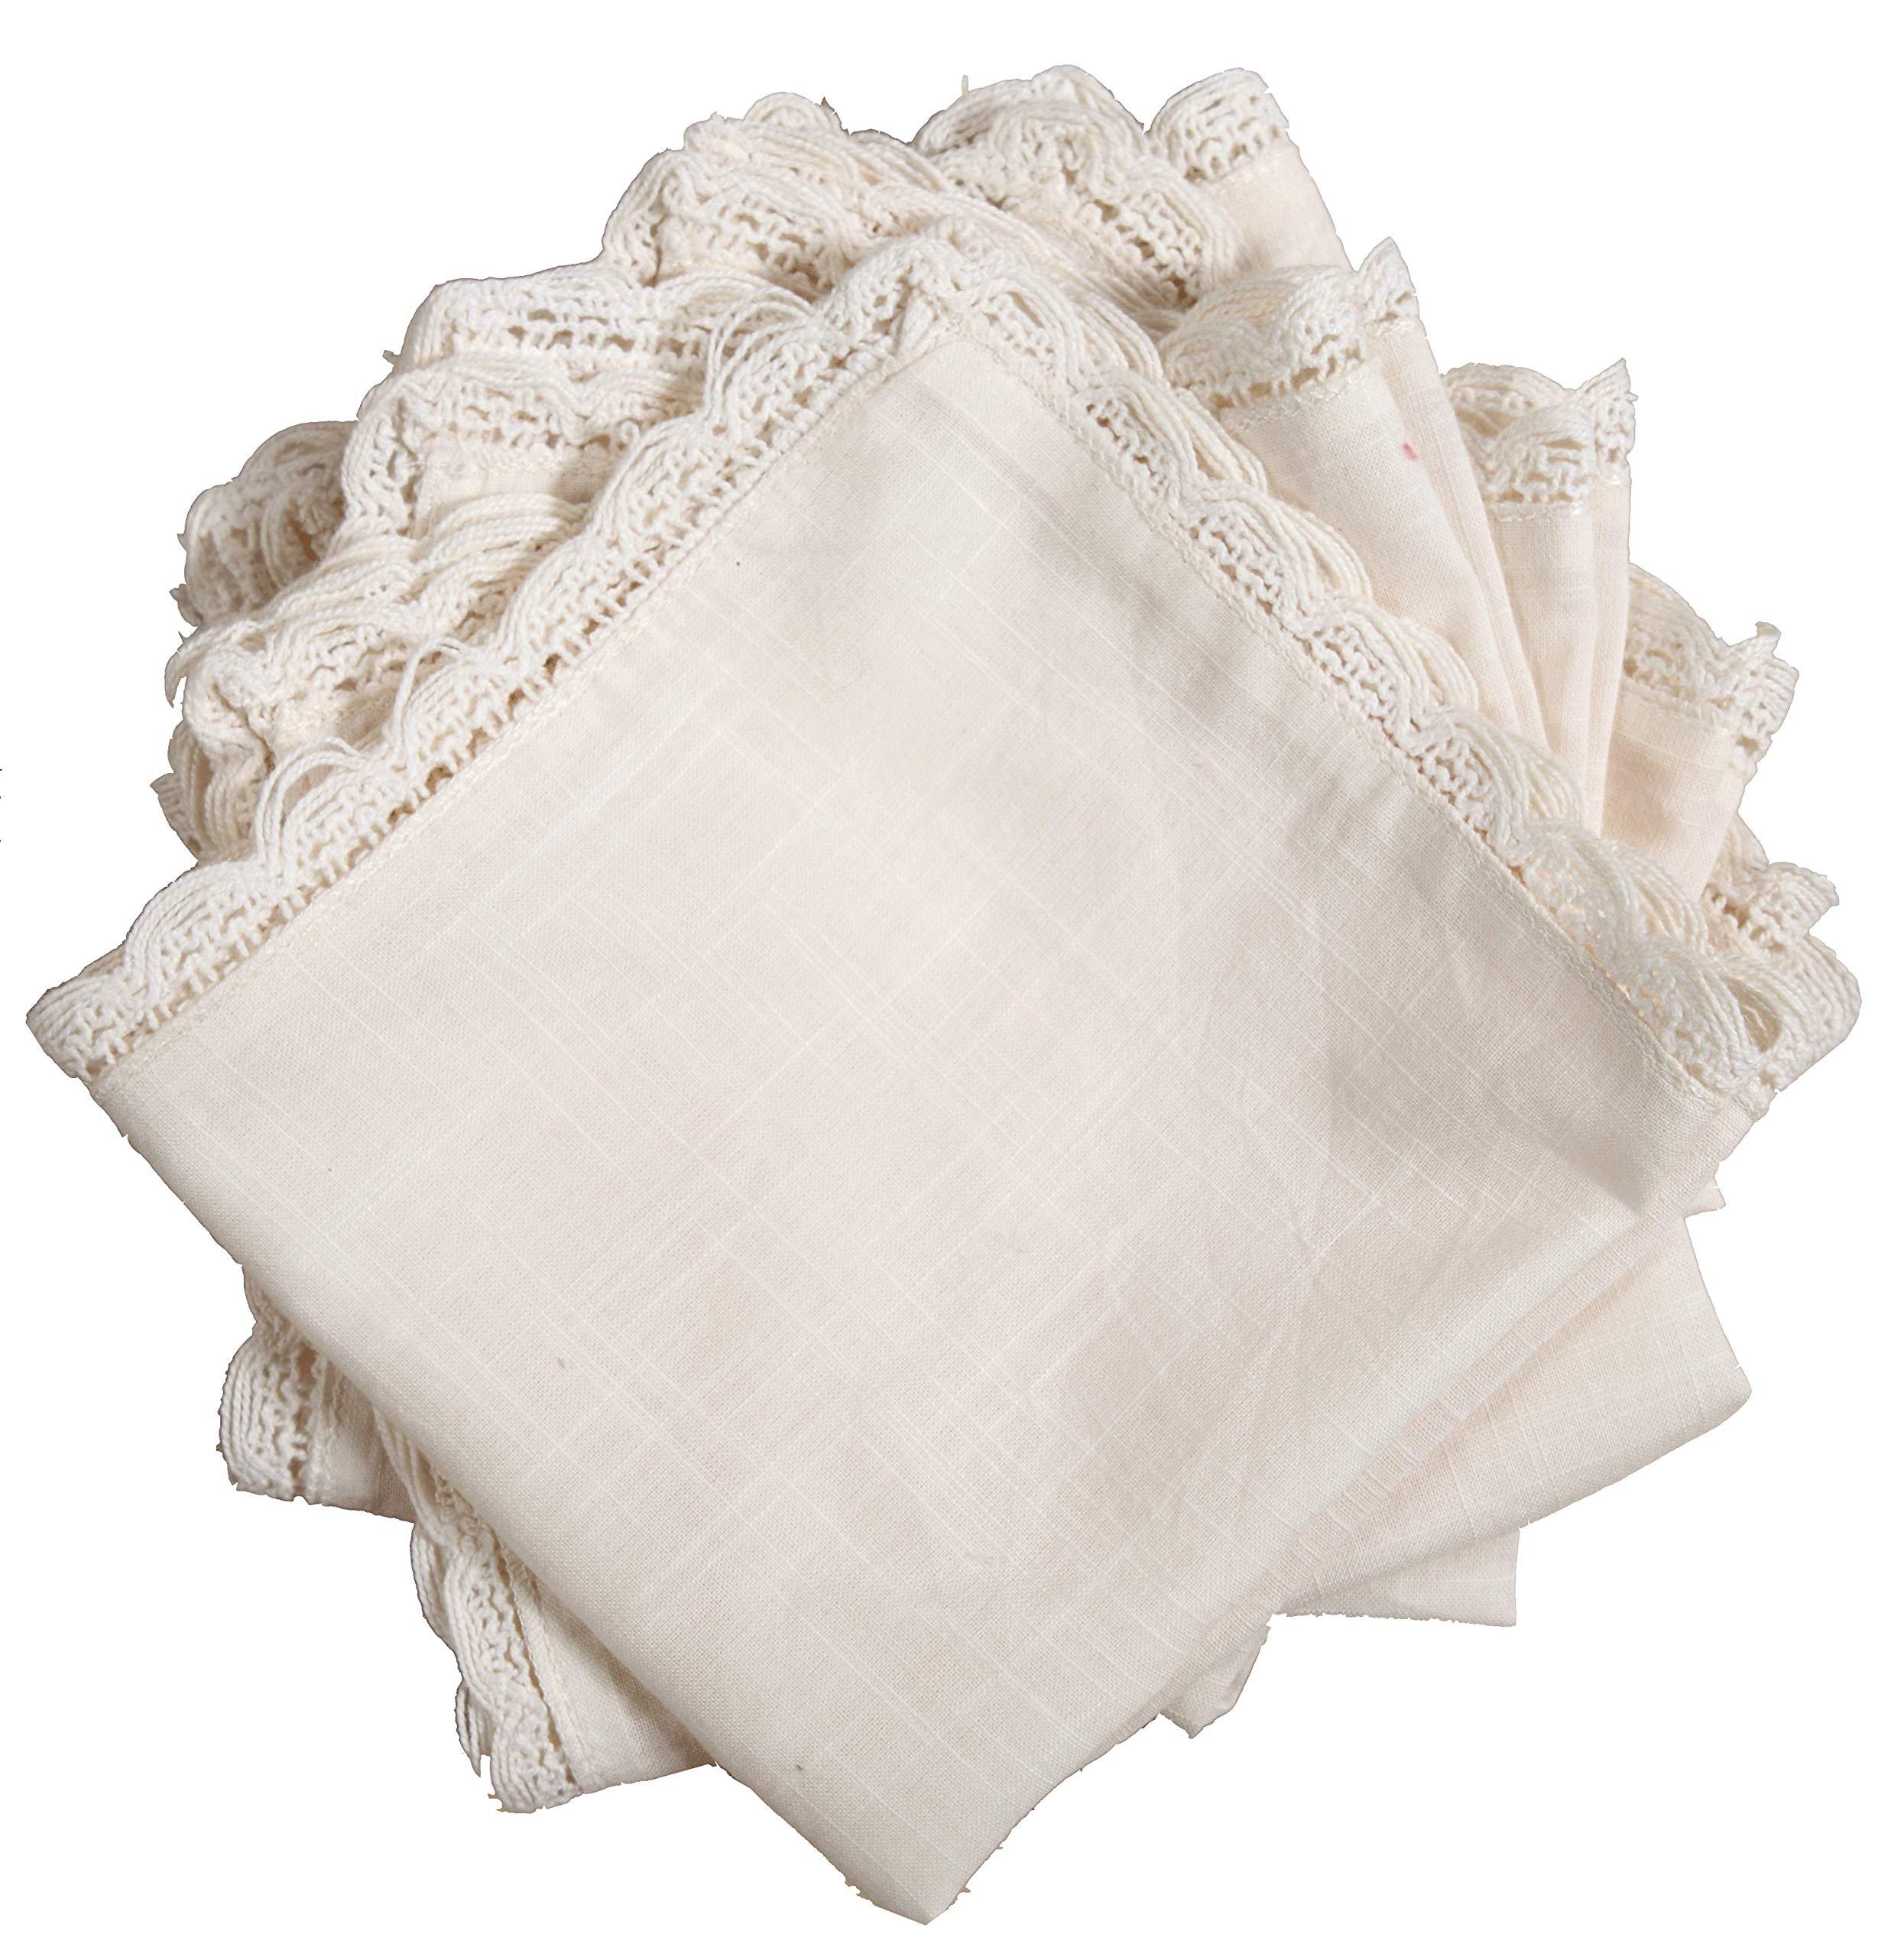 Linen Clubs Slub Cotton Handkerchief with Crochet Edges Set of 12 - Off White